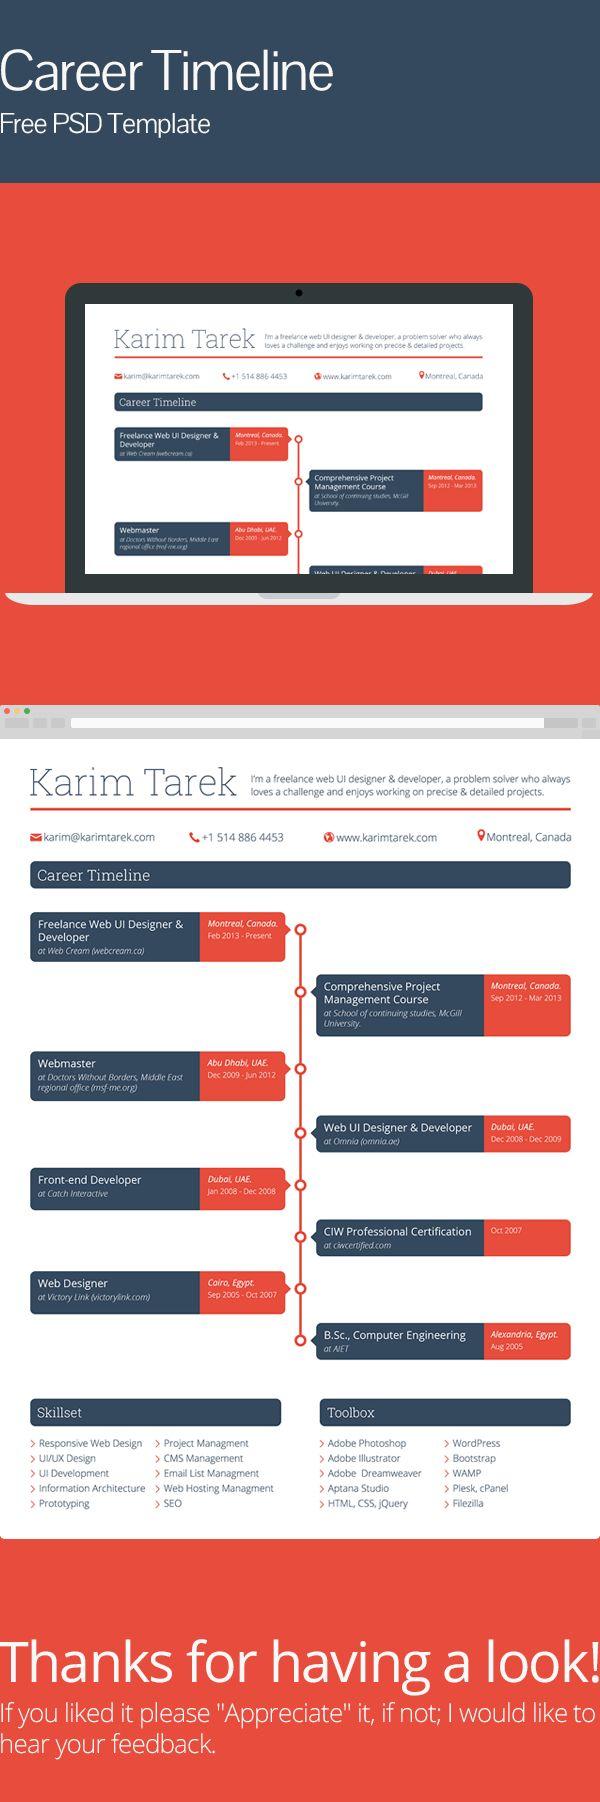 40 best Résumé images on Pinterest | Resume design, Design resume ...